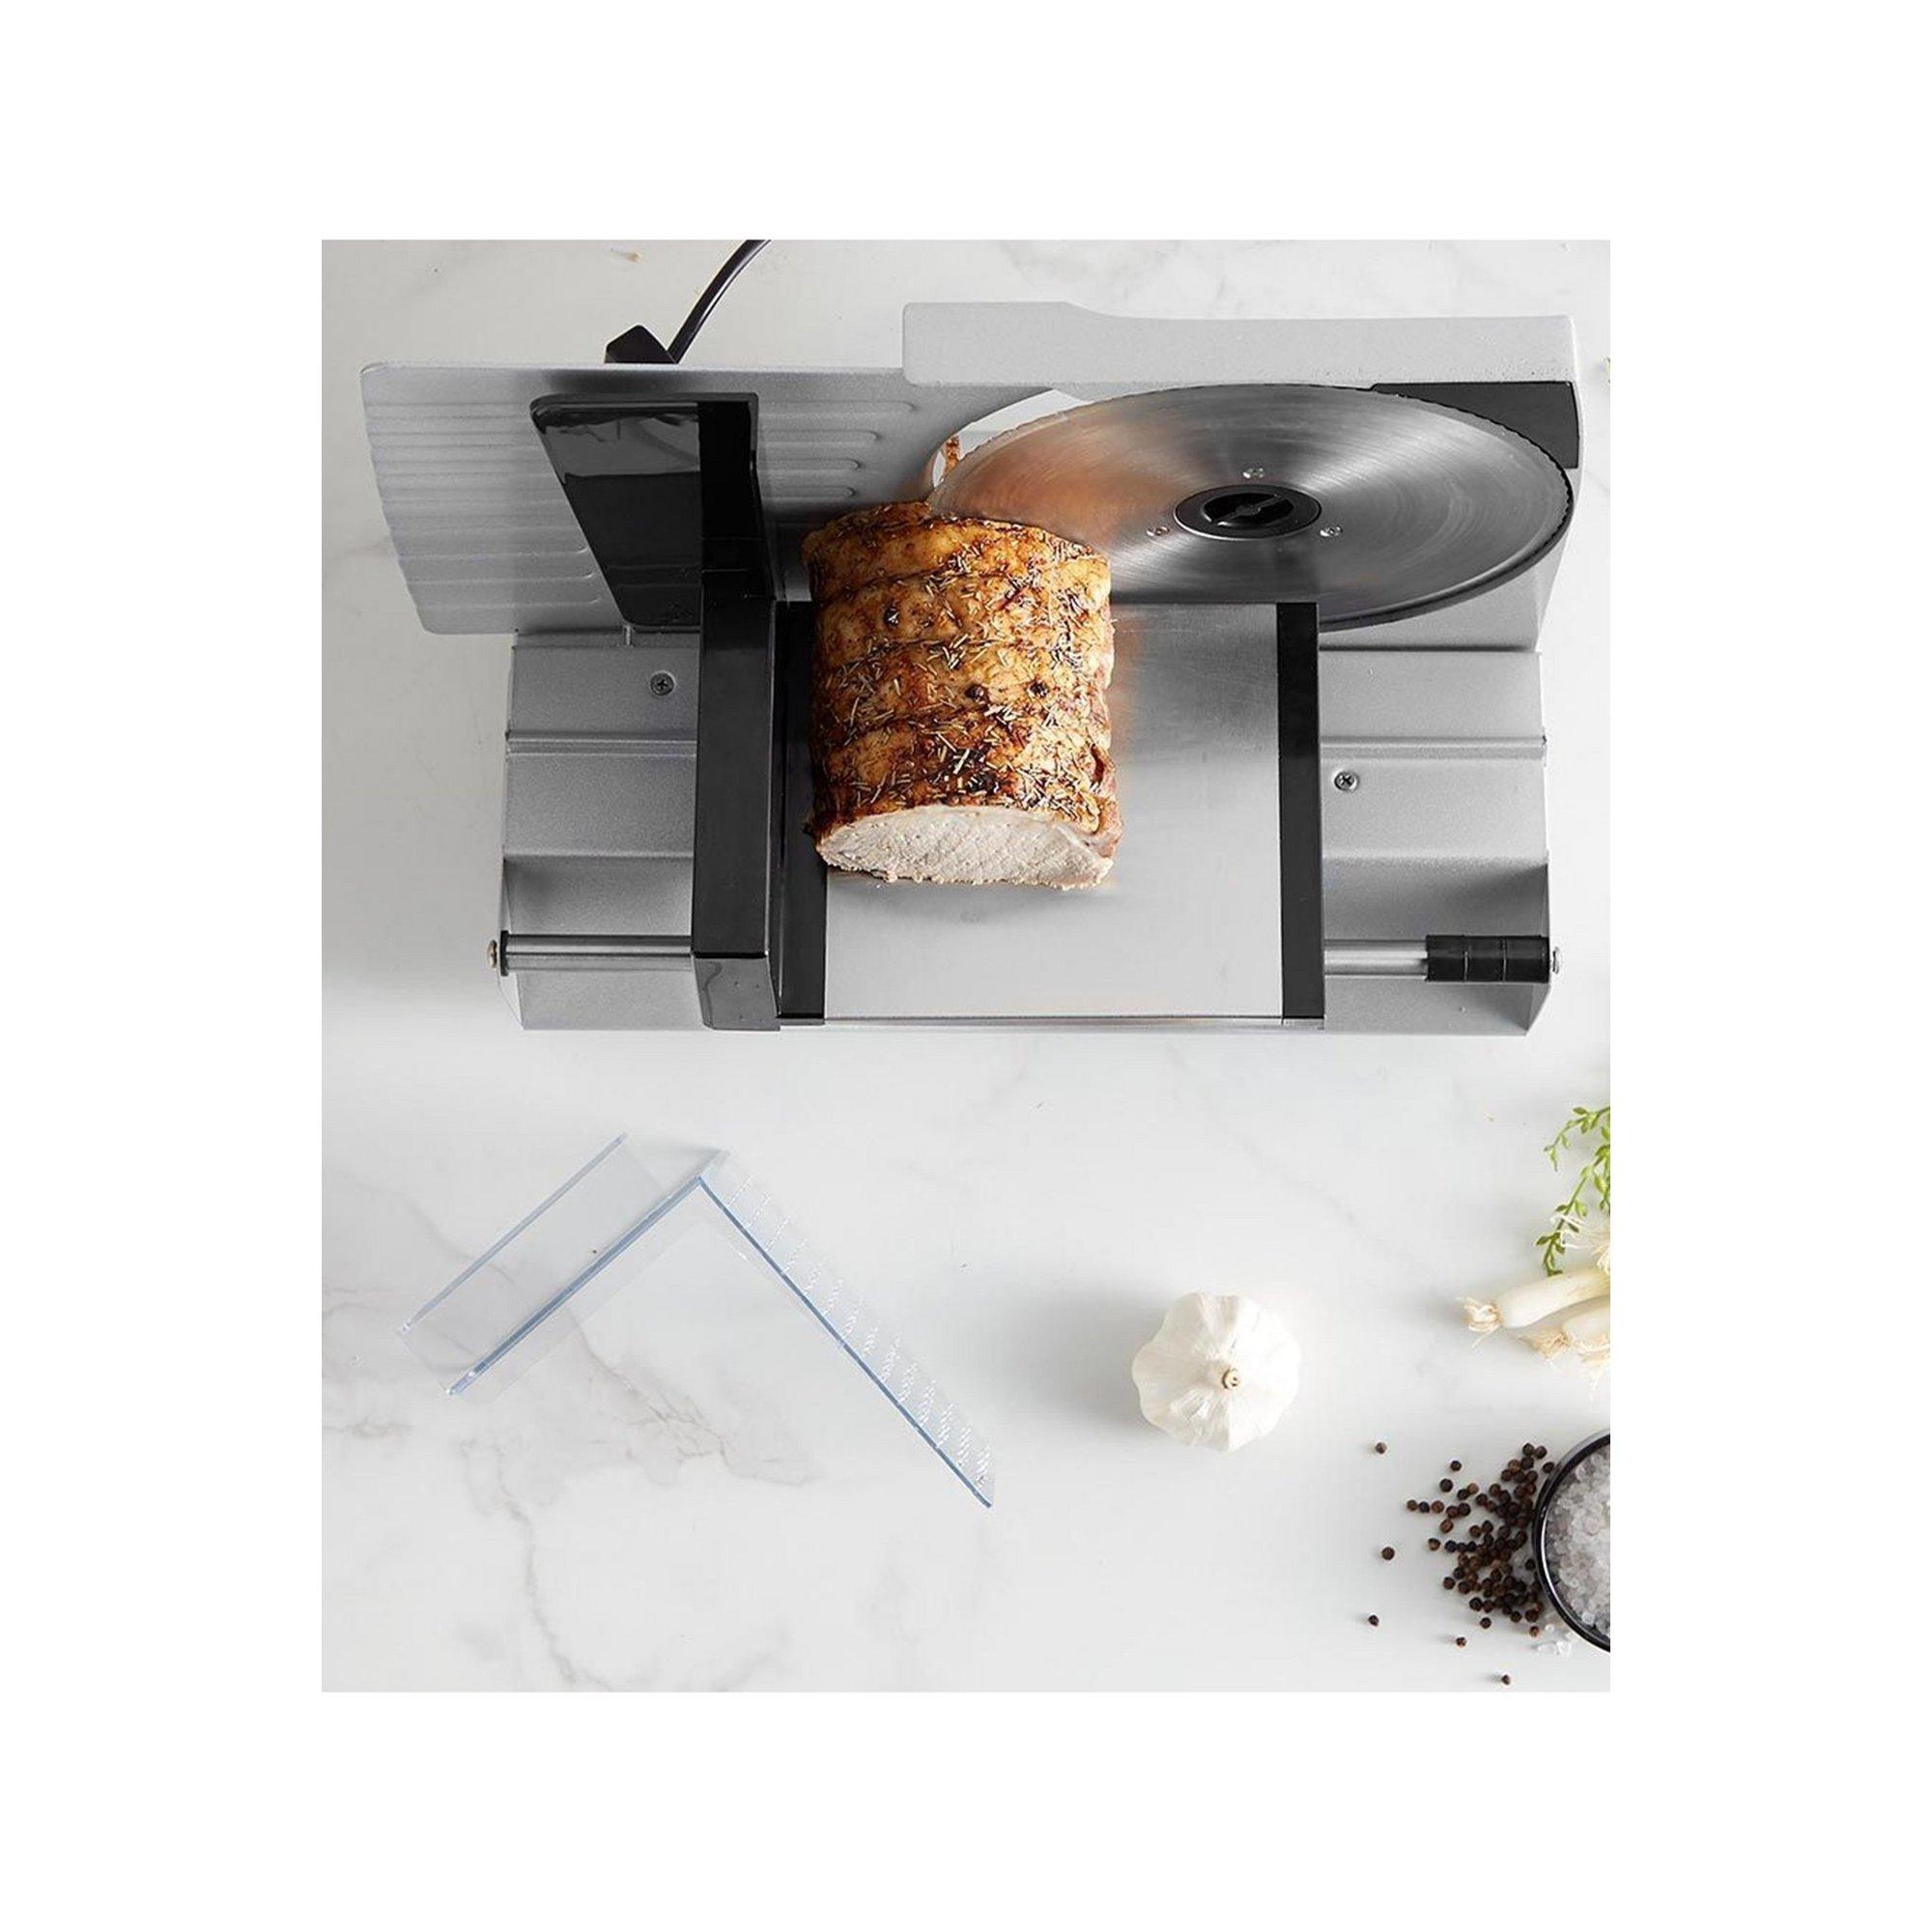 Image of VonShef Stainless Steel Meat Slicer